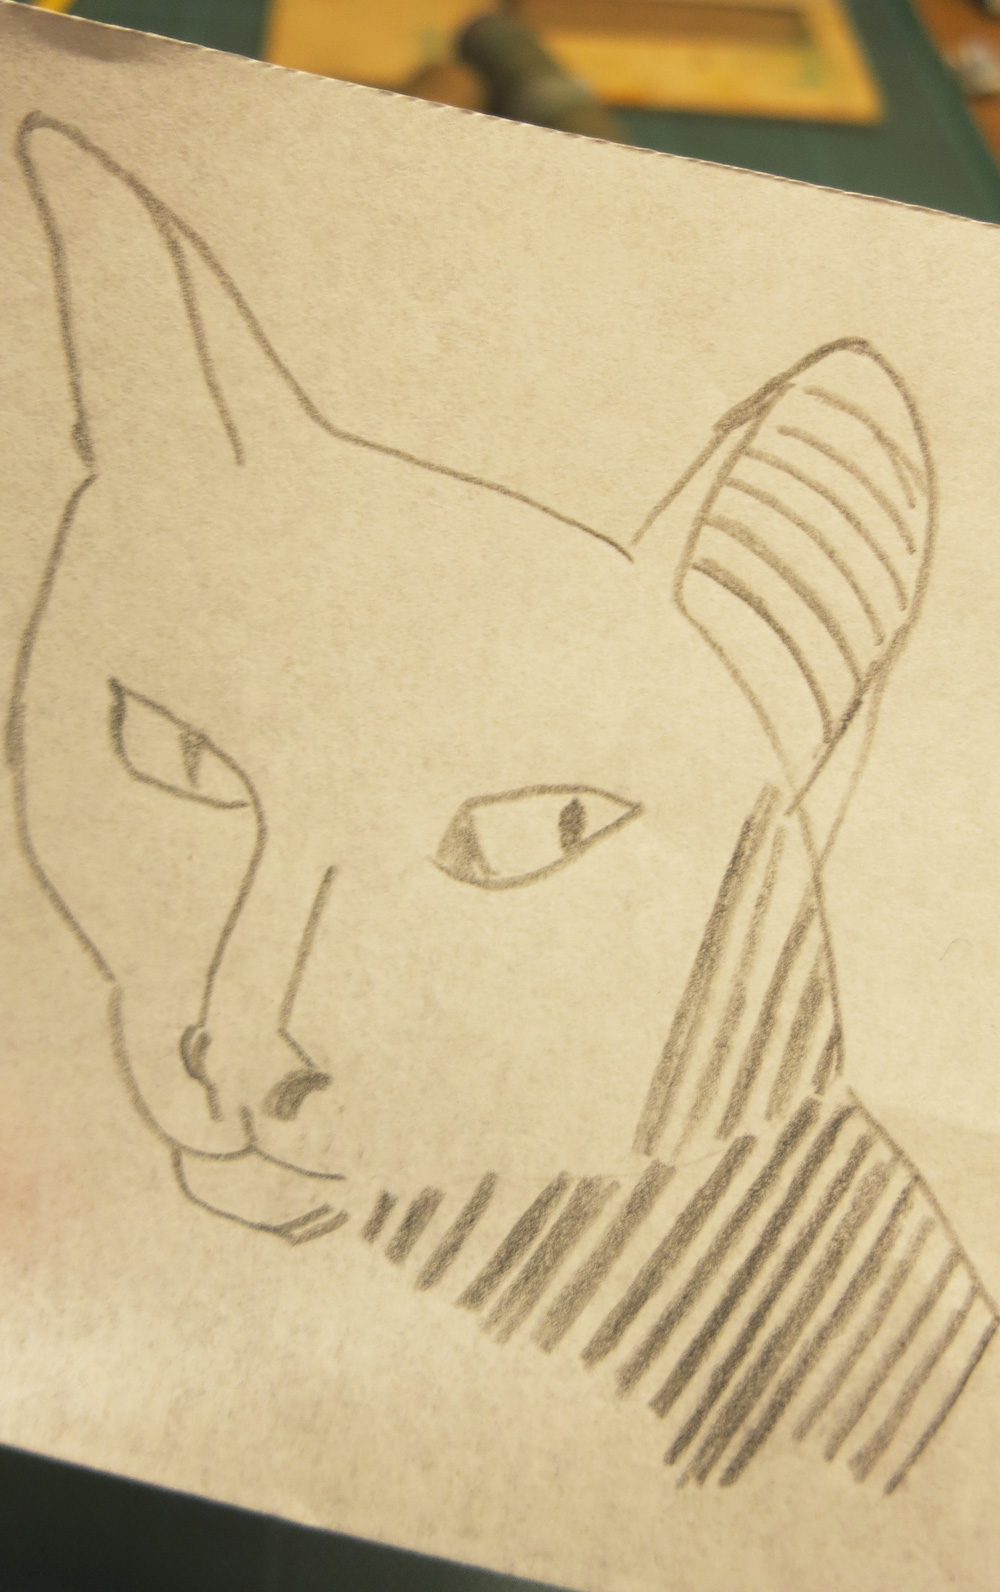 D-xilopress-xilografia-ilustracion-fotopolimeros-grabado-taller-letra-por-letra-papel-principal-letterpress-imprenta-tipografica-1.jpg